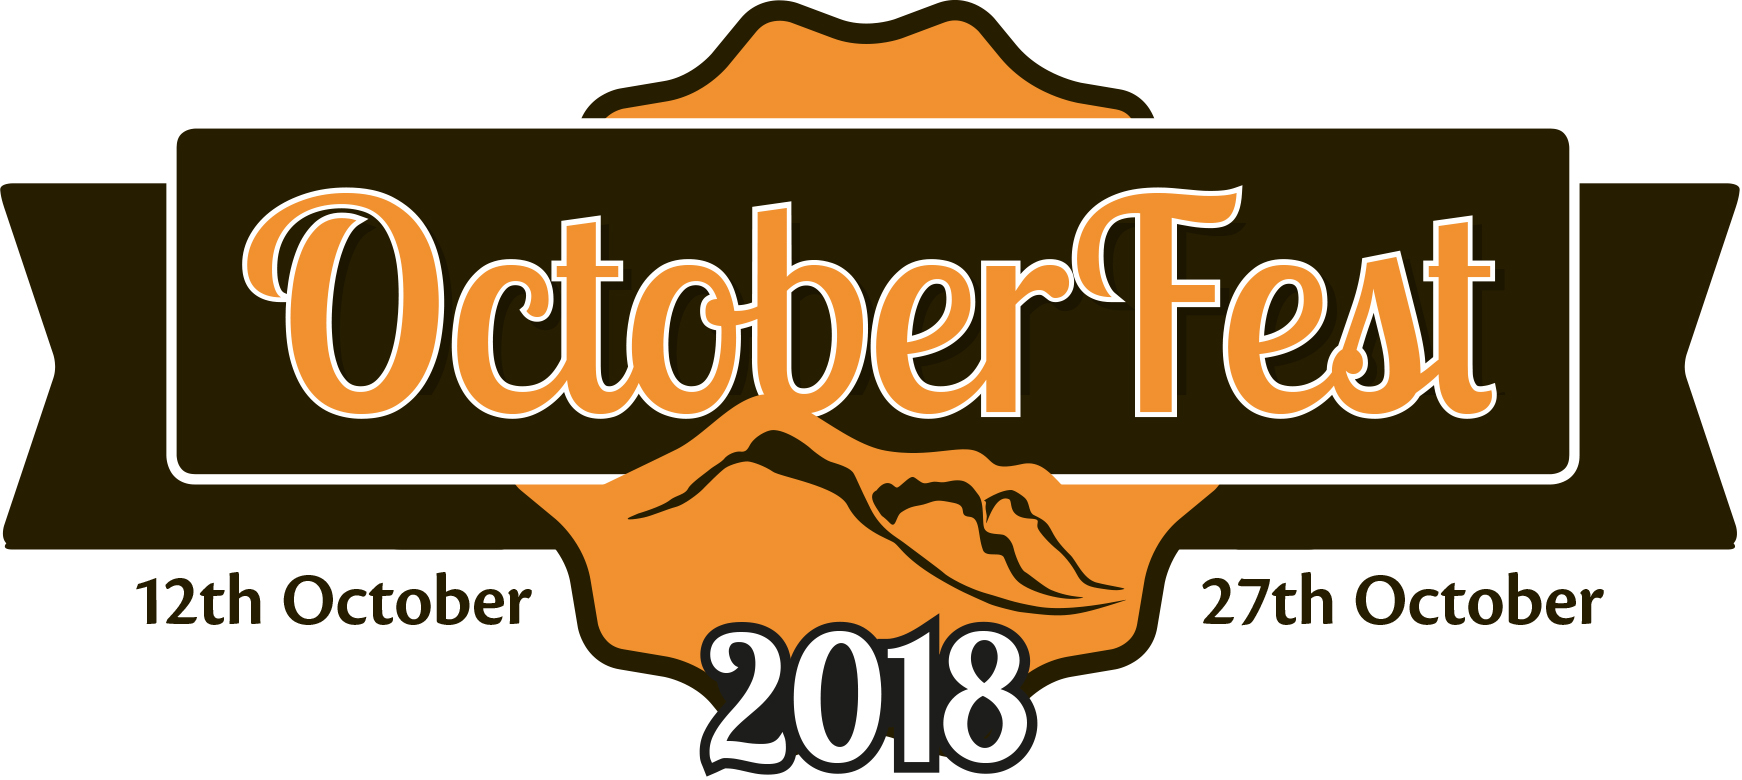 Octoberfest 2018